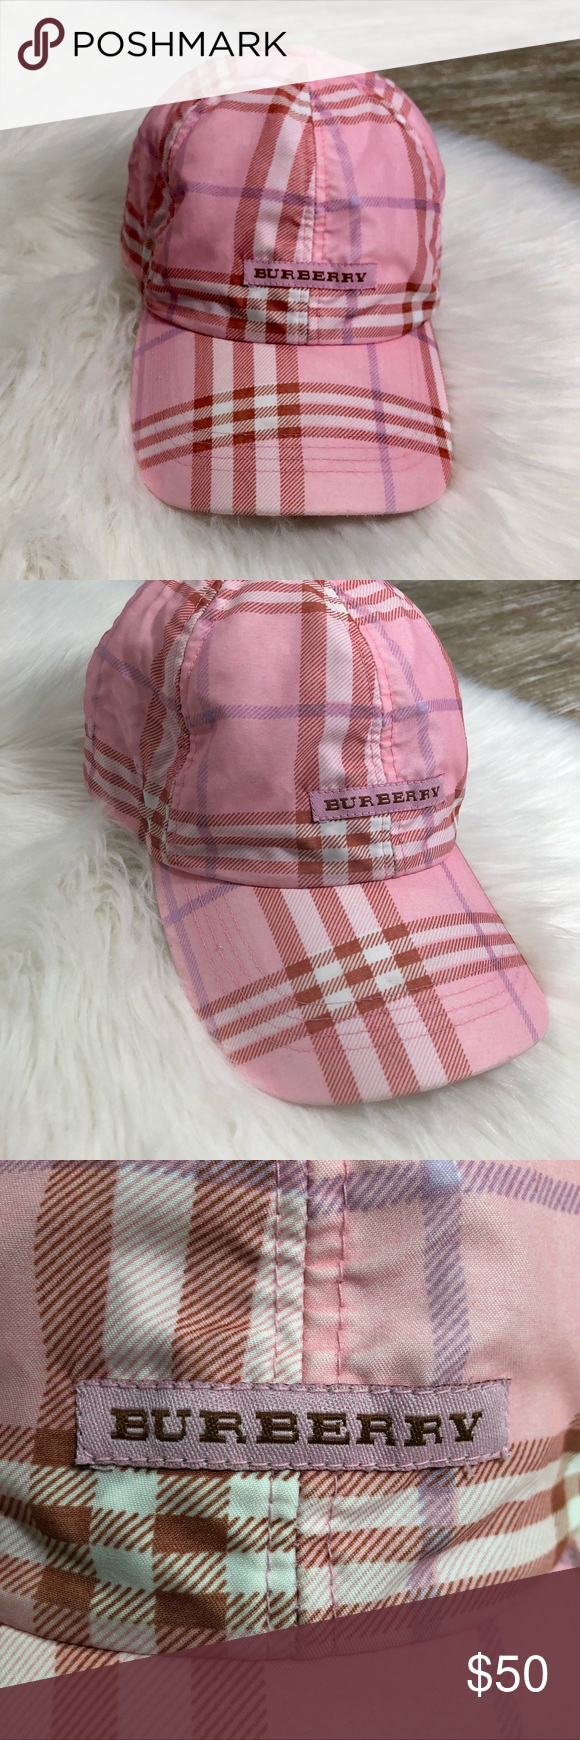 Burberry Girls Pink Plaid Hat Cap One Size Burberry Kids Girls Pink Plaid Hat  Pink with purple and dark orange plaid. One size Measurements  Across brim  ... 81c3cb44355